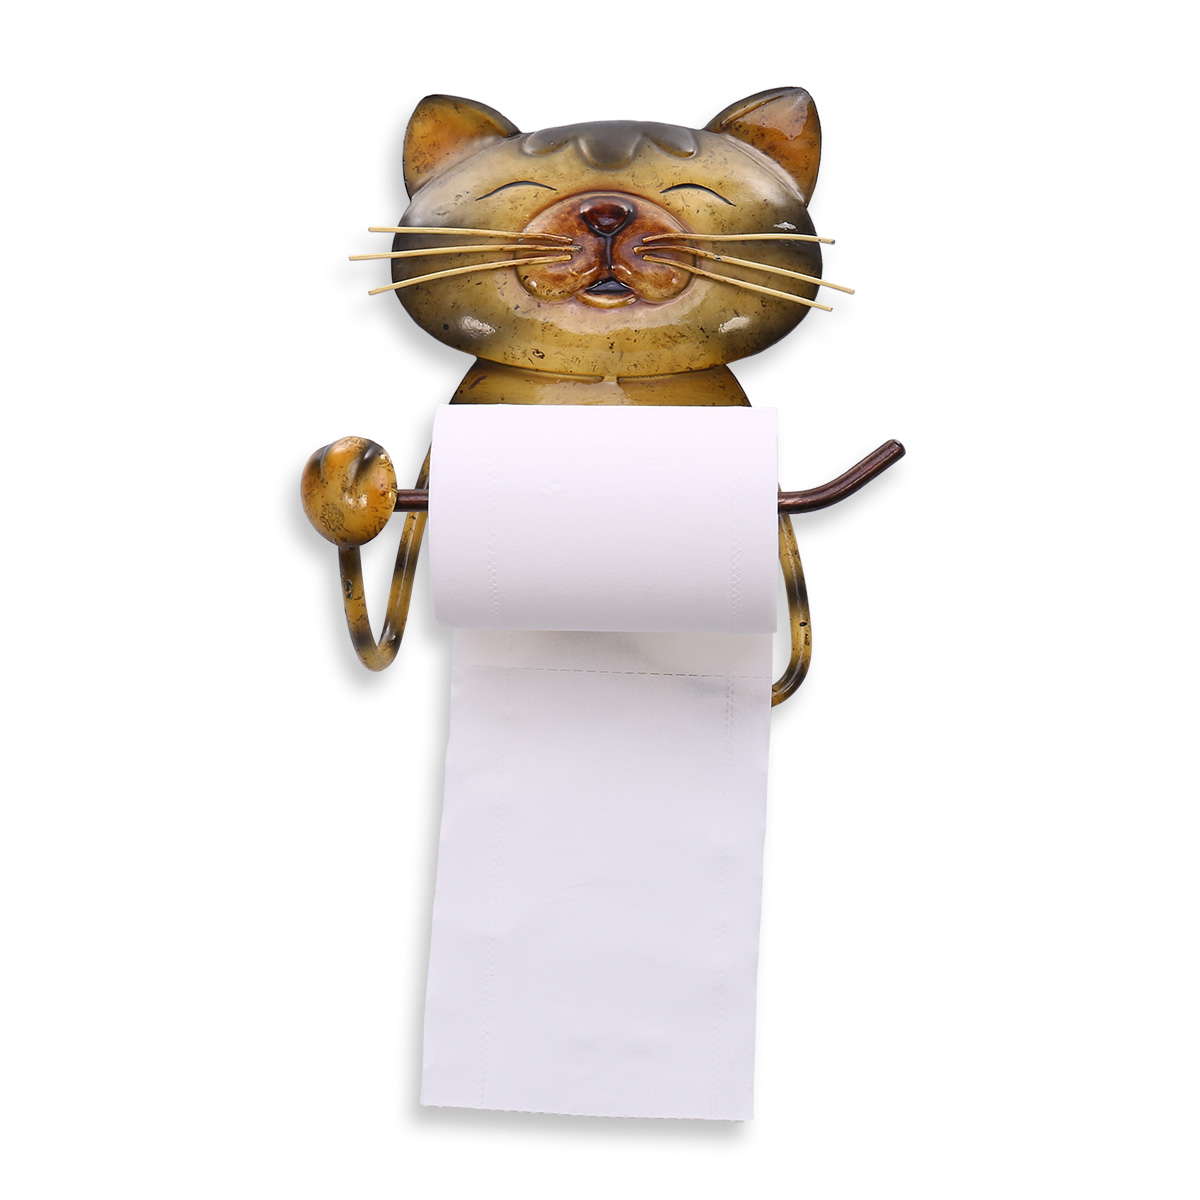 Aliexpress.com : Buy Cat Bathroom Paper Towel Holder Vintage Cast Iron Dog Toilet Paper Holder